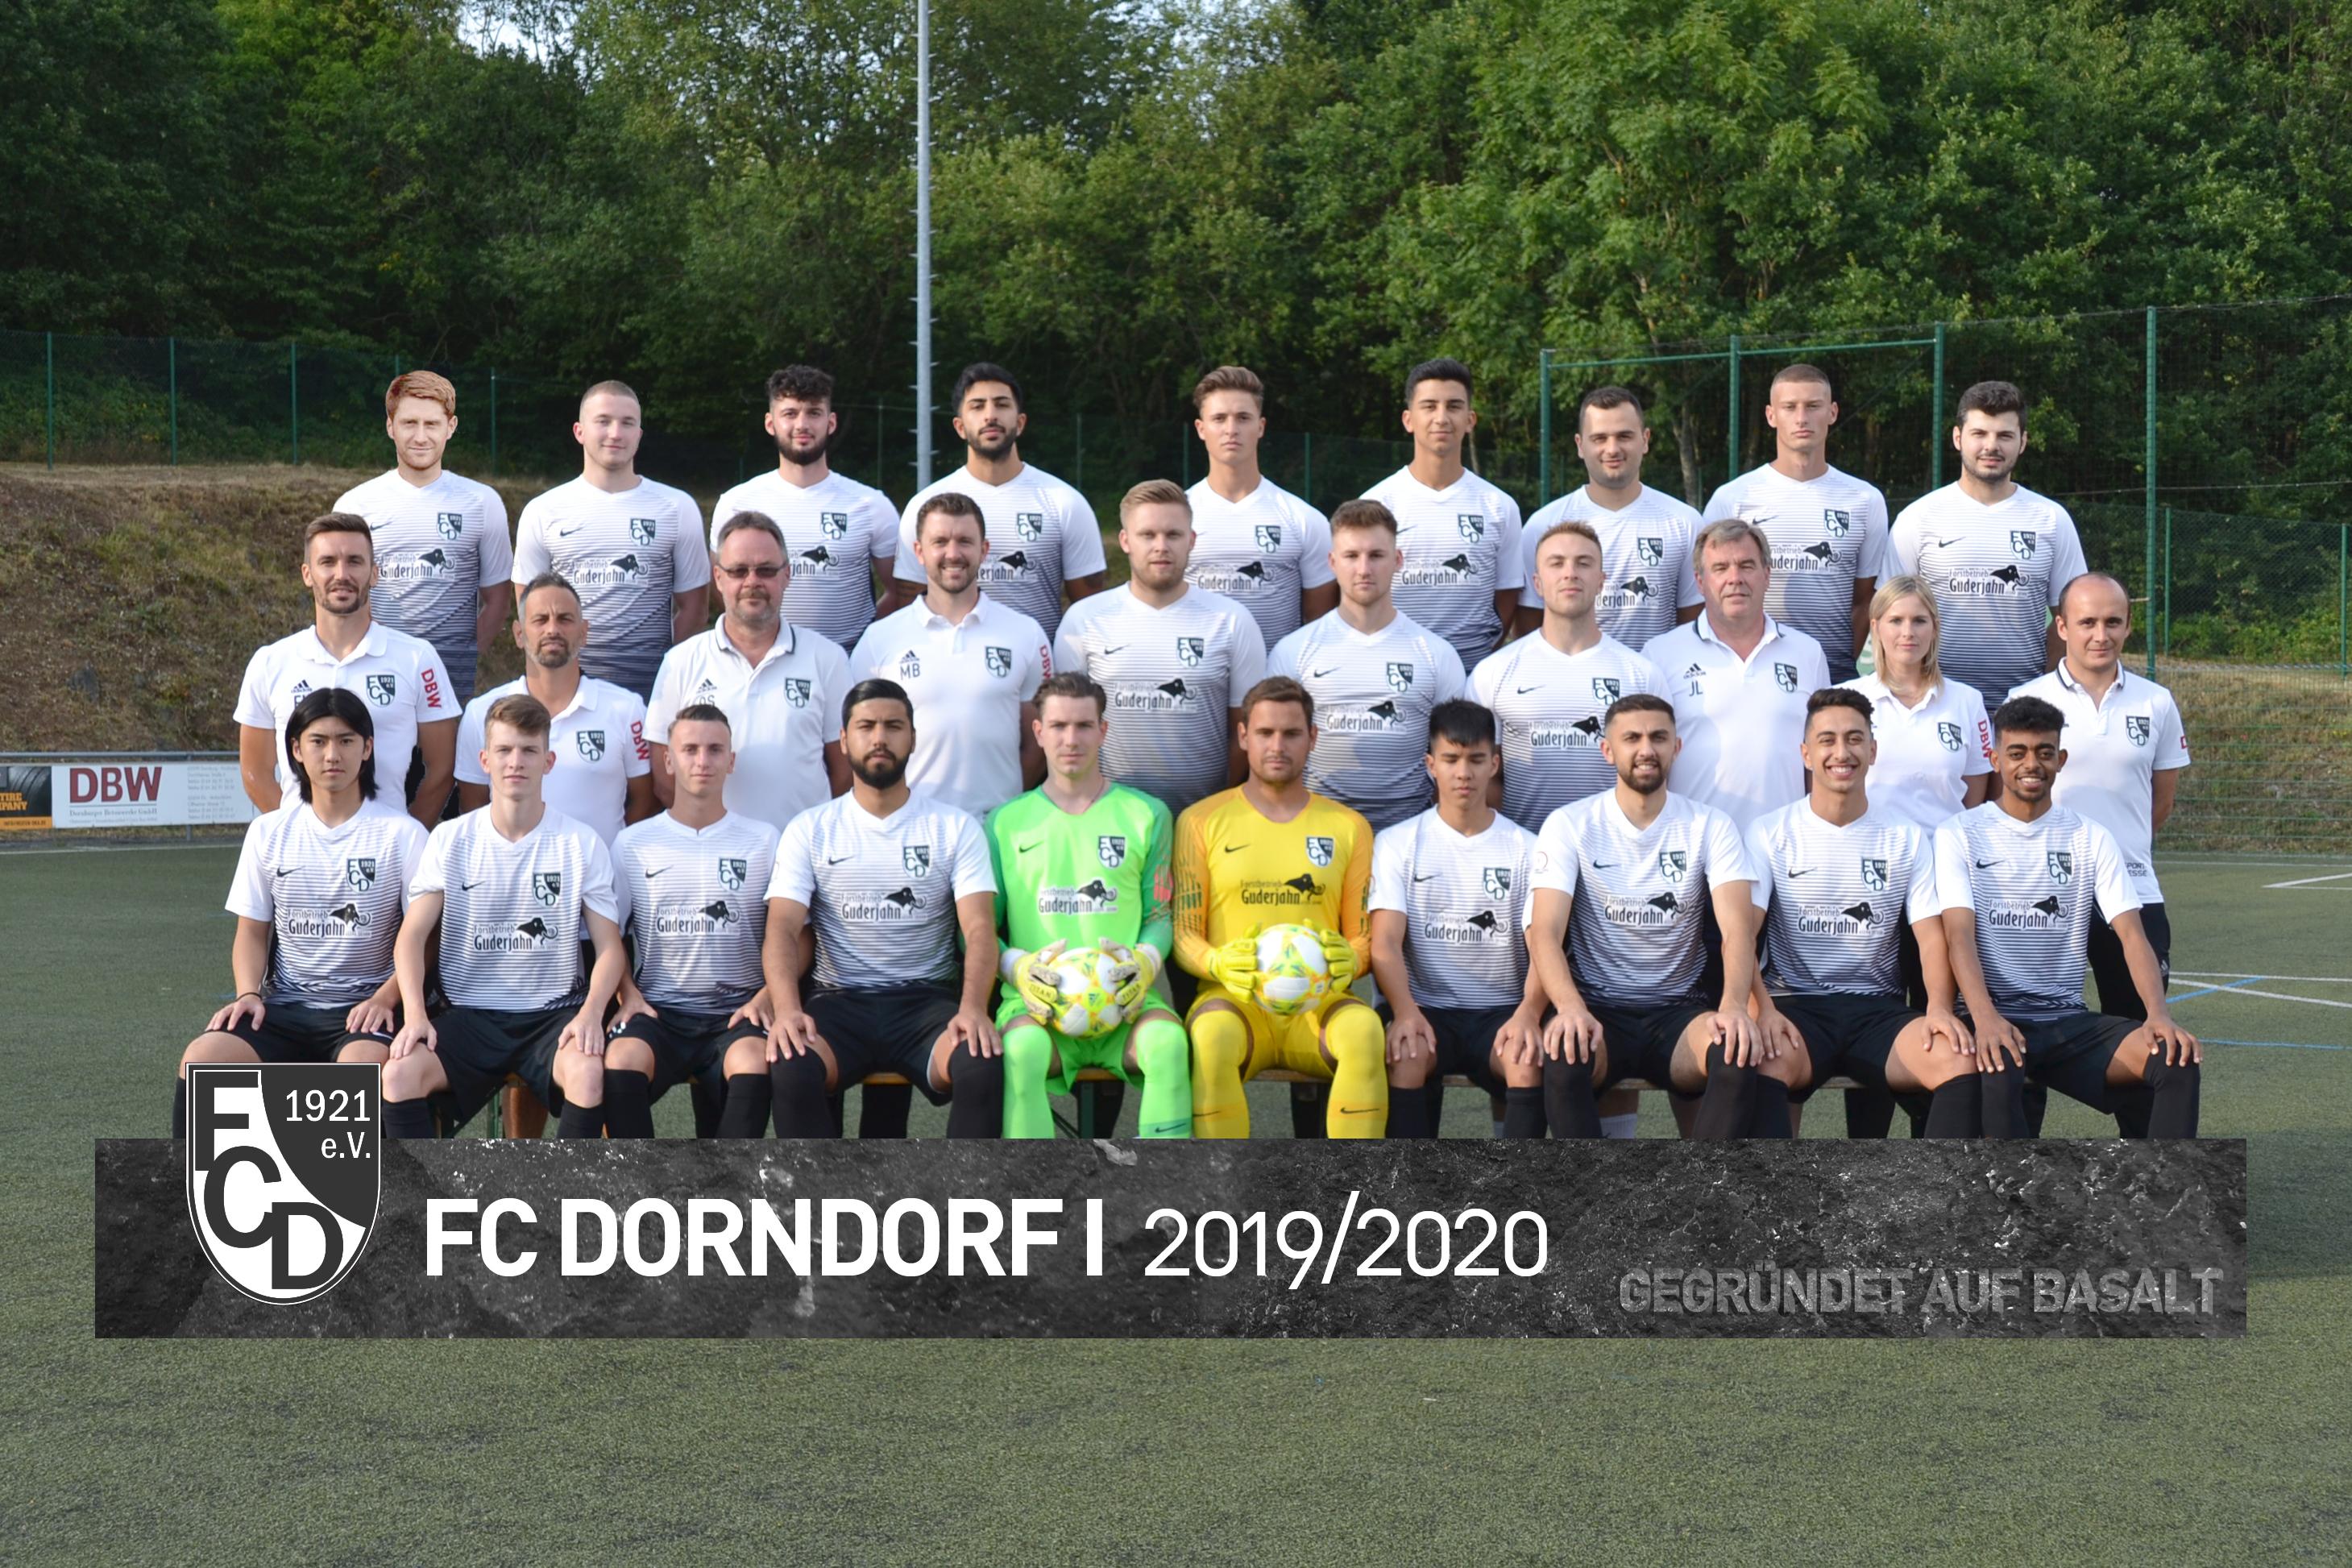 FCD 1 Mannschaftsfoto 2019-2020.jpg